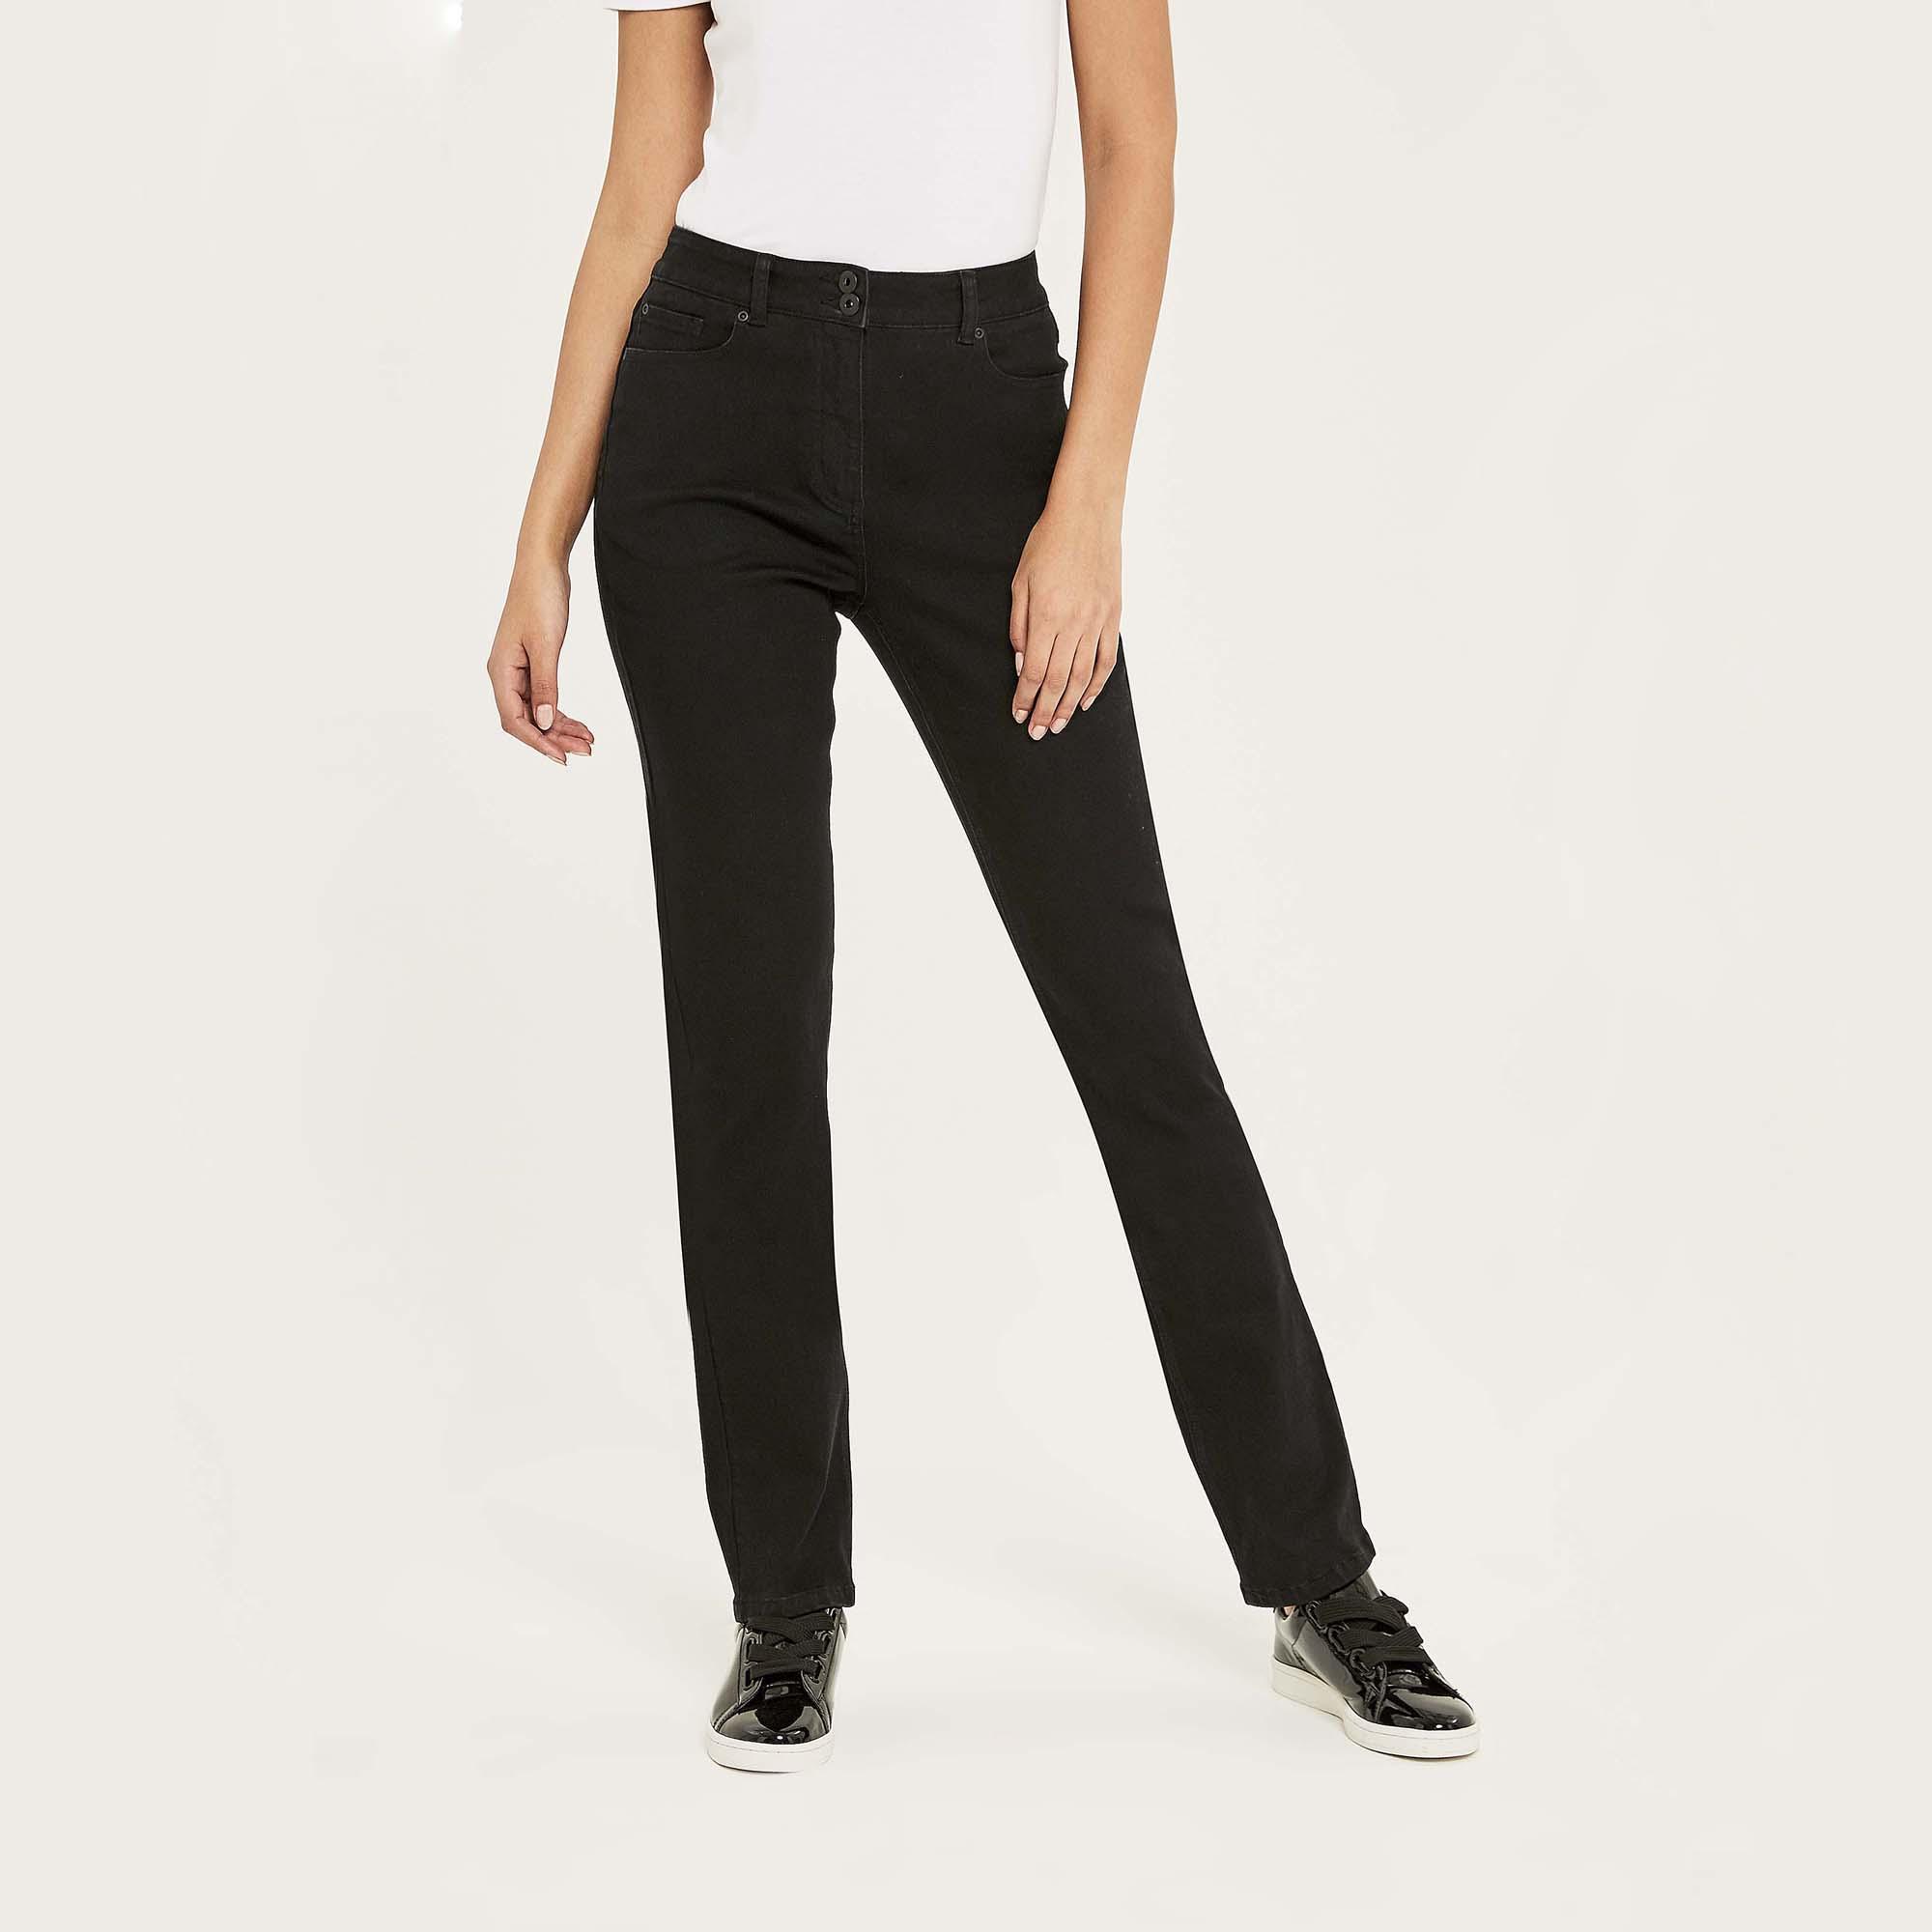 Black High Rise Straight Leg Jeans